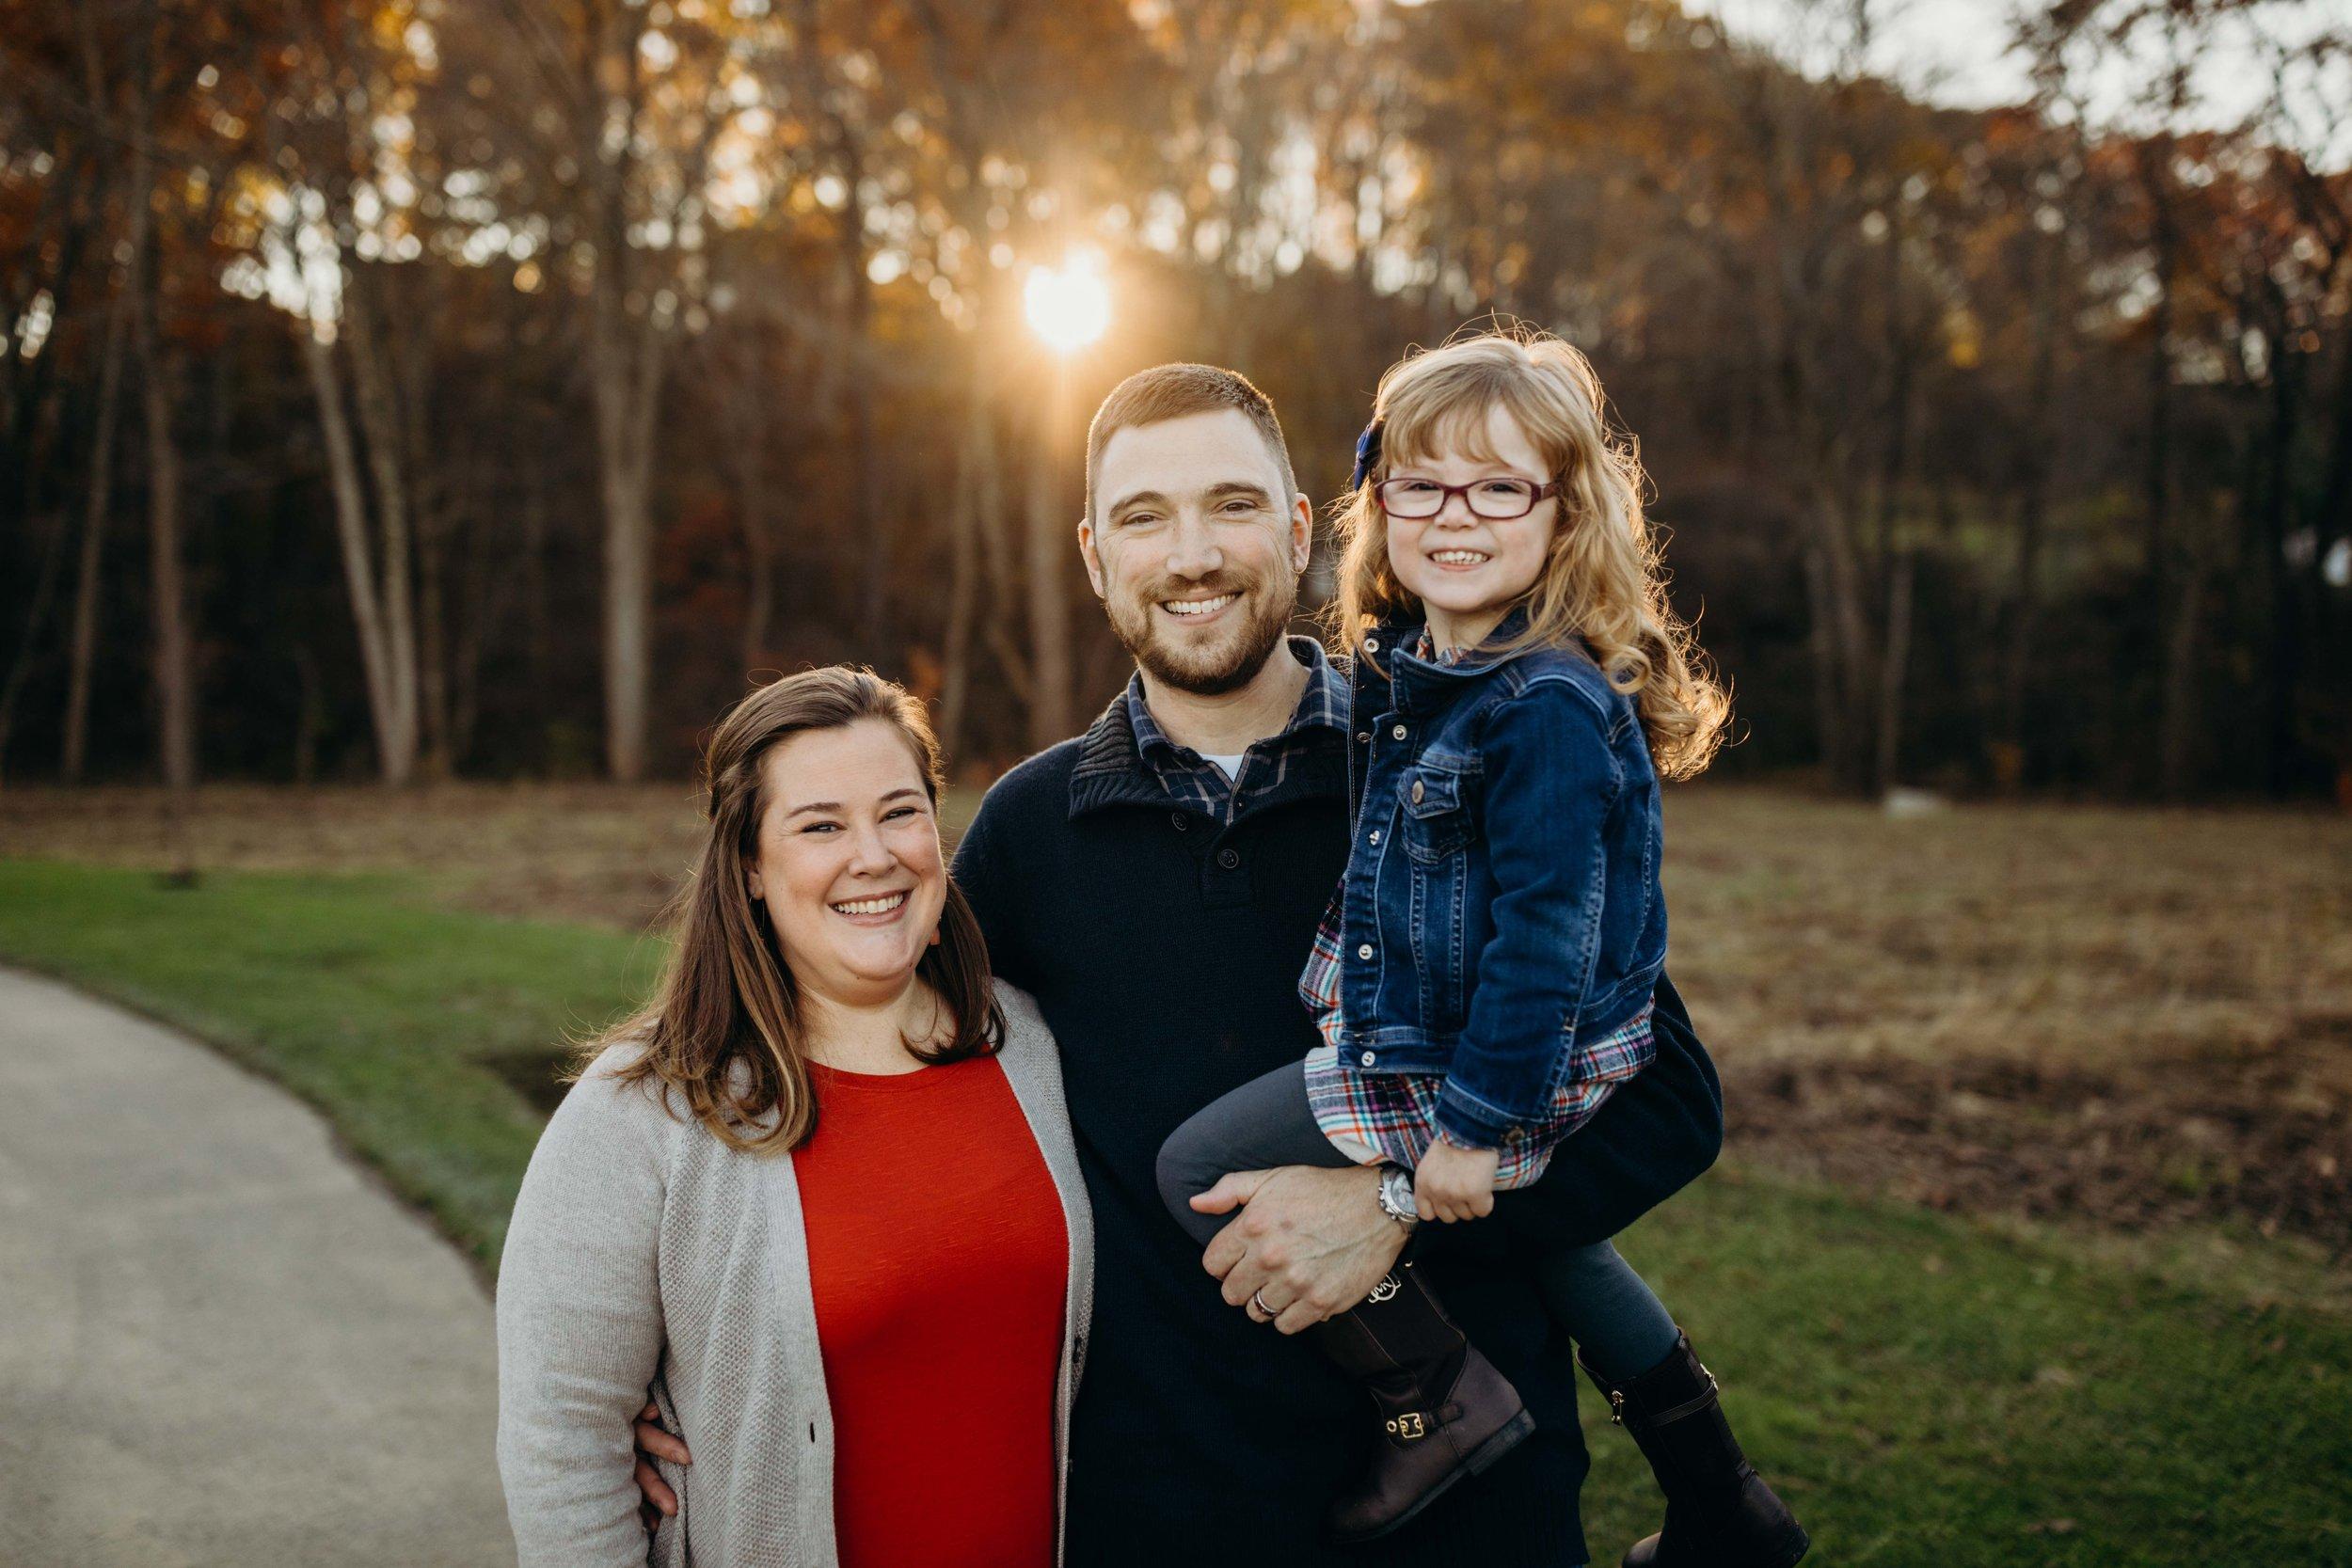 Family Portraits - Abruzzese Family - North Park-7.jpg